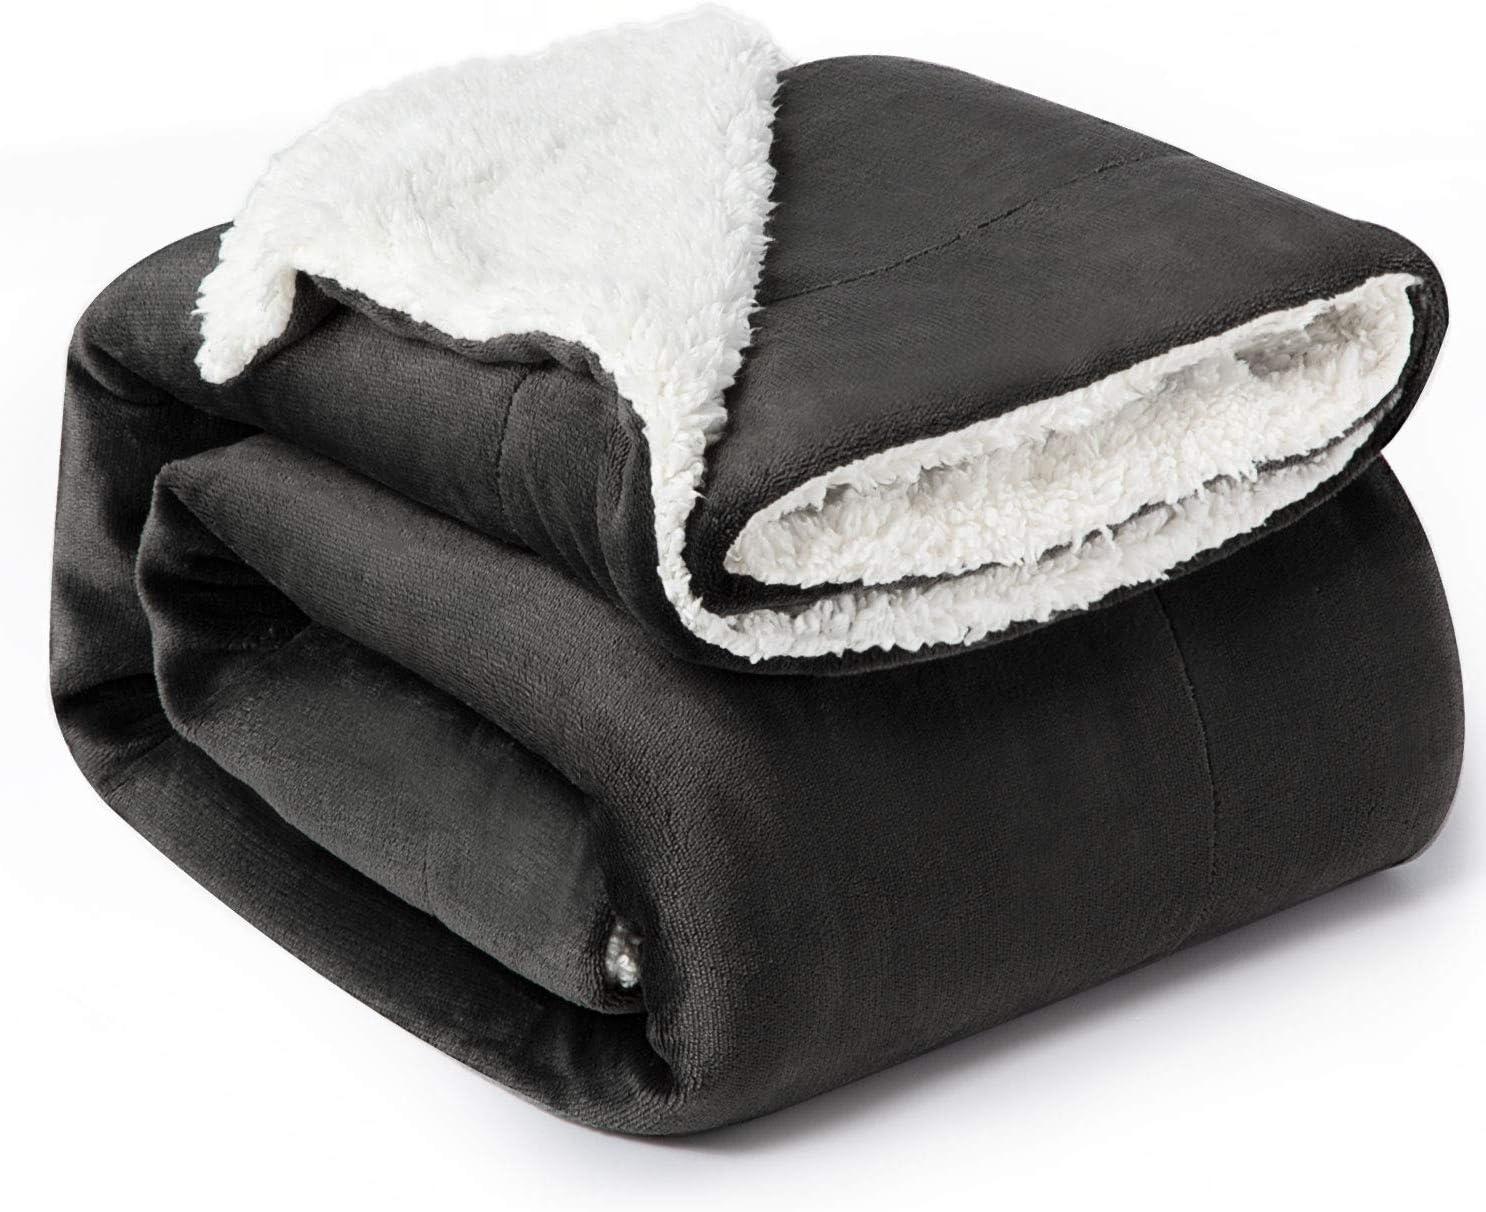 Bedsure Manta Reversible de Franela/Sherpa 150x200cm - Manta para Cama 90 de 100% Microfibra Extra Suave - Manta de Felpa Negro Ceniza